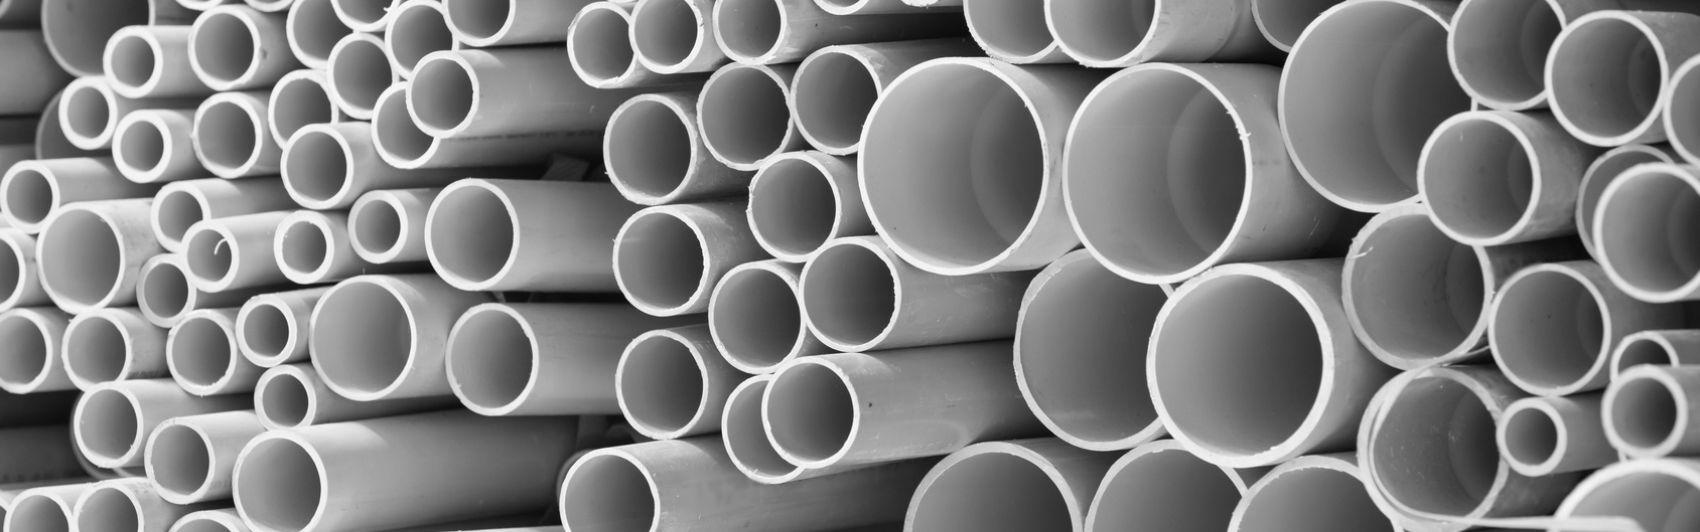 Kunststoffverarbeitende Industrie